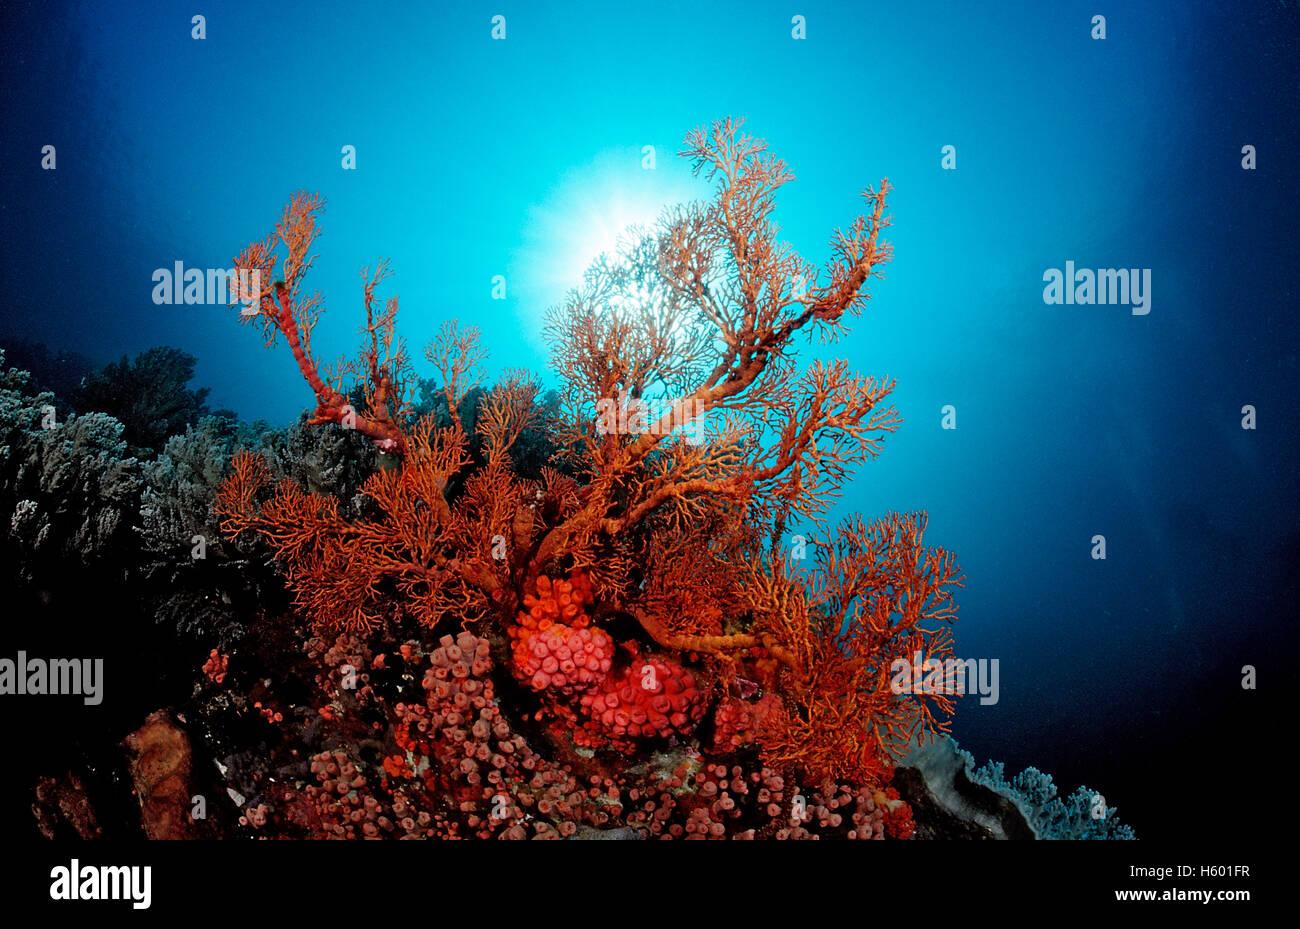 Coral reef with Sea Fan (Gorgonaria sp.), Komodo, Flores, Indonesia, Southeast Asia Stock Photo